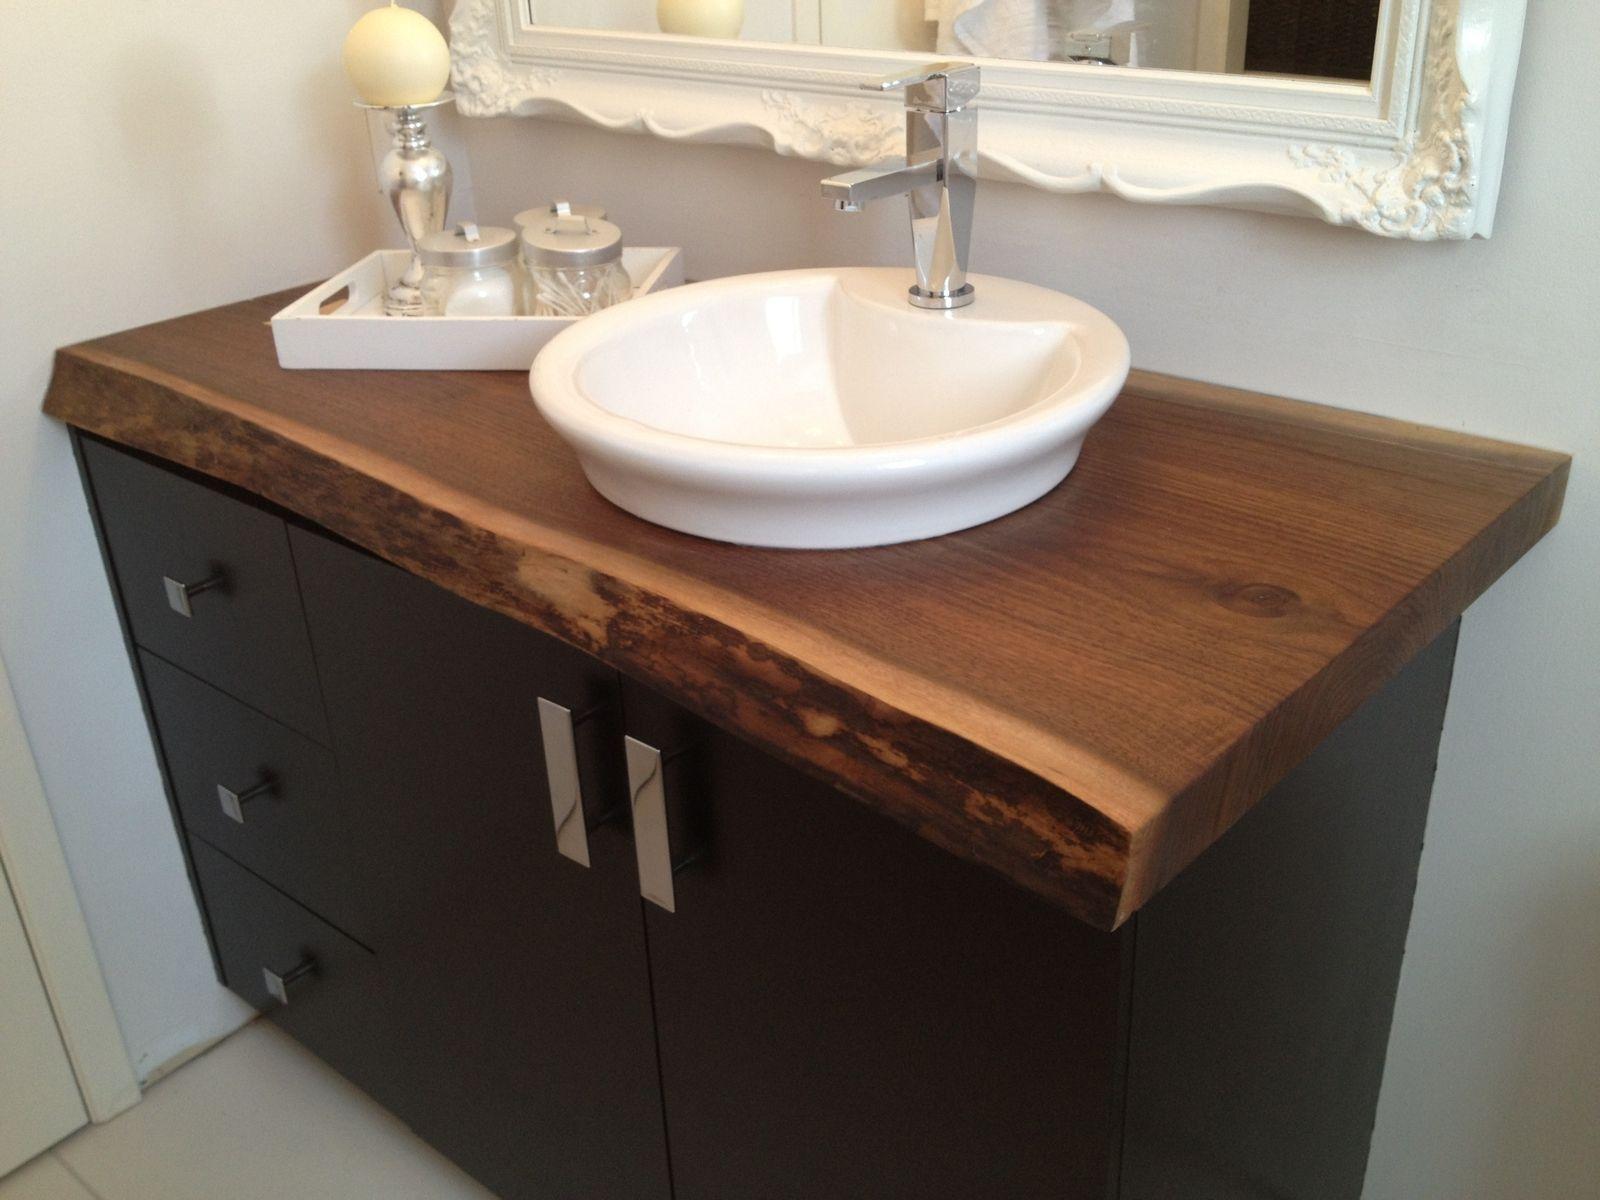 Bathroom Countertop With Images Diy Bathroom Vanity Vessel